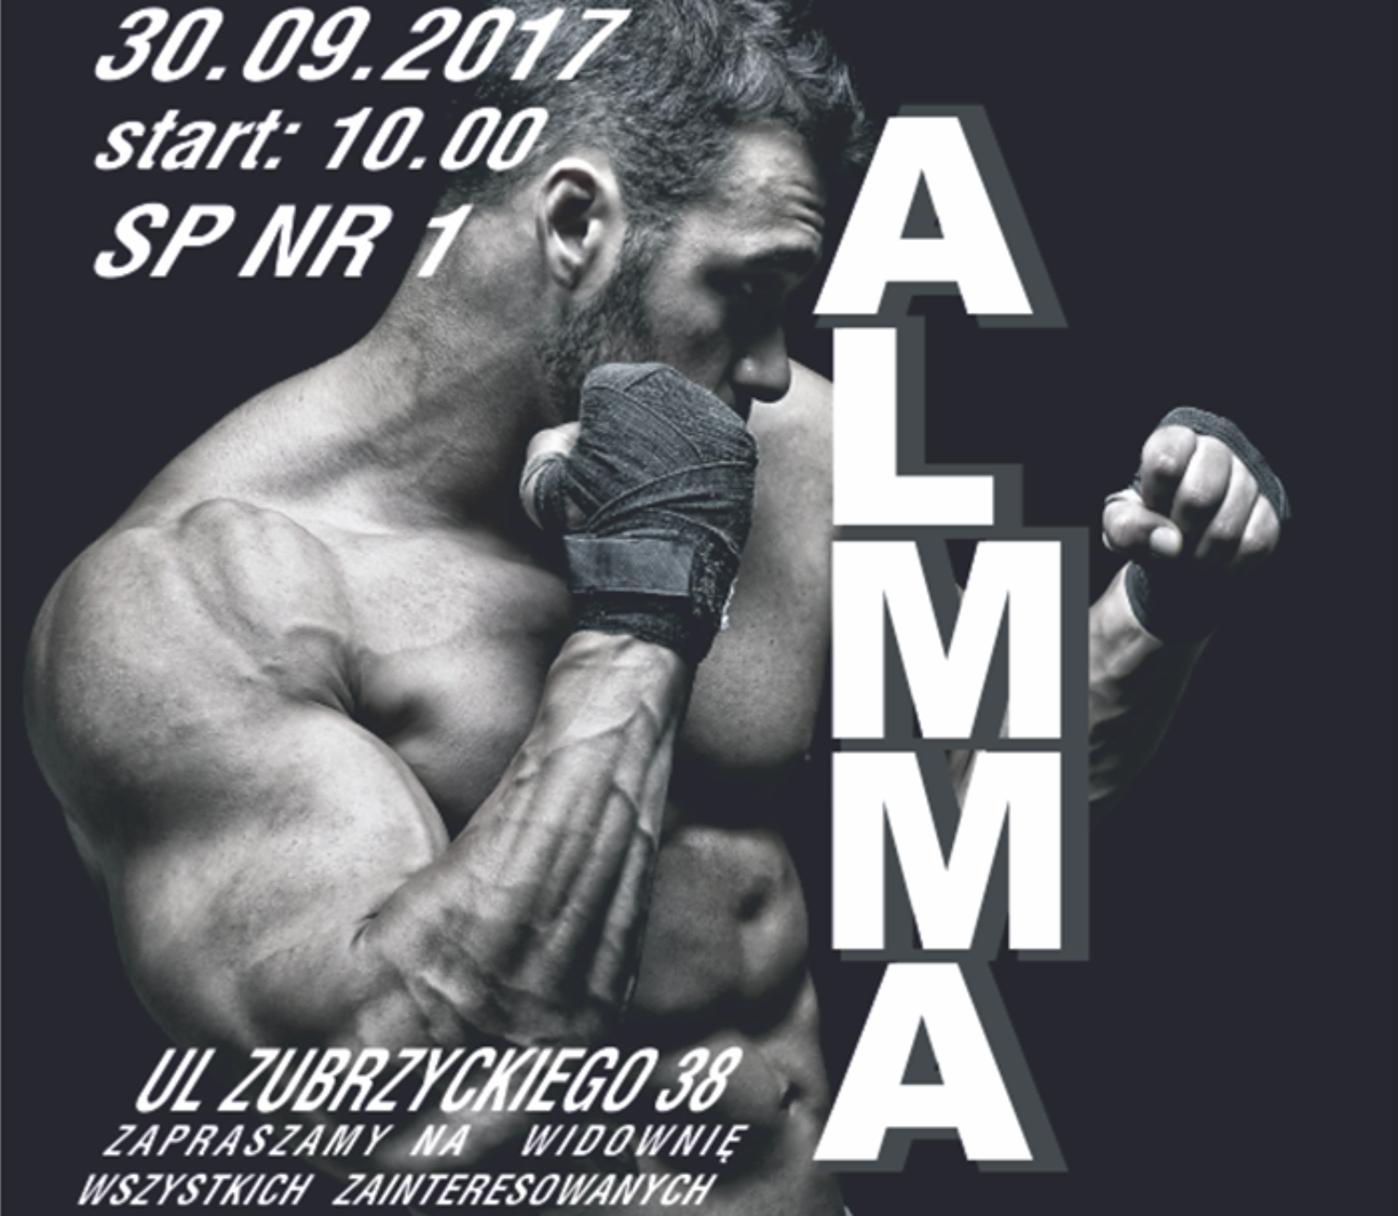 ALLMA - Mistrzostwa Śląska